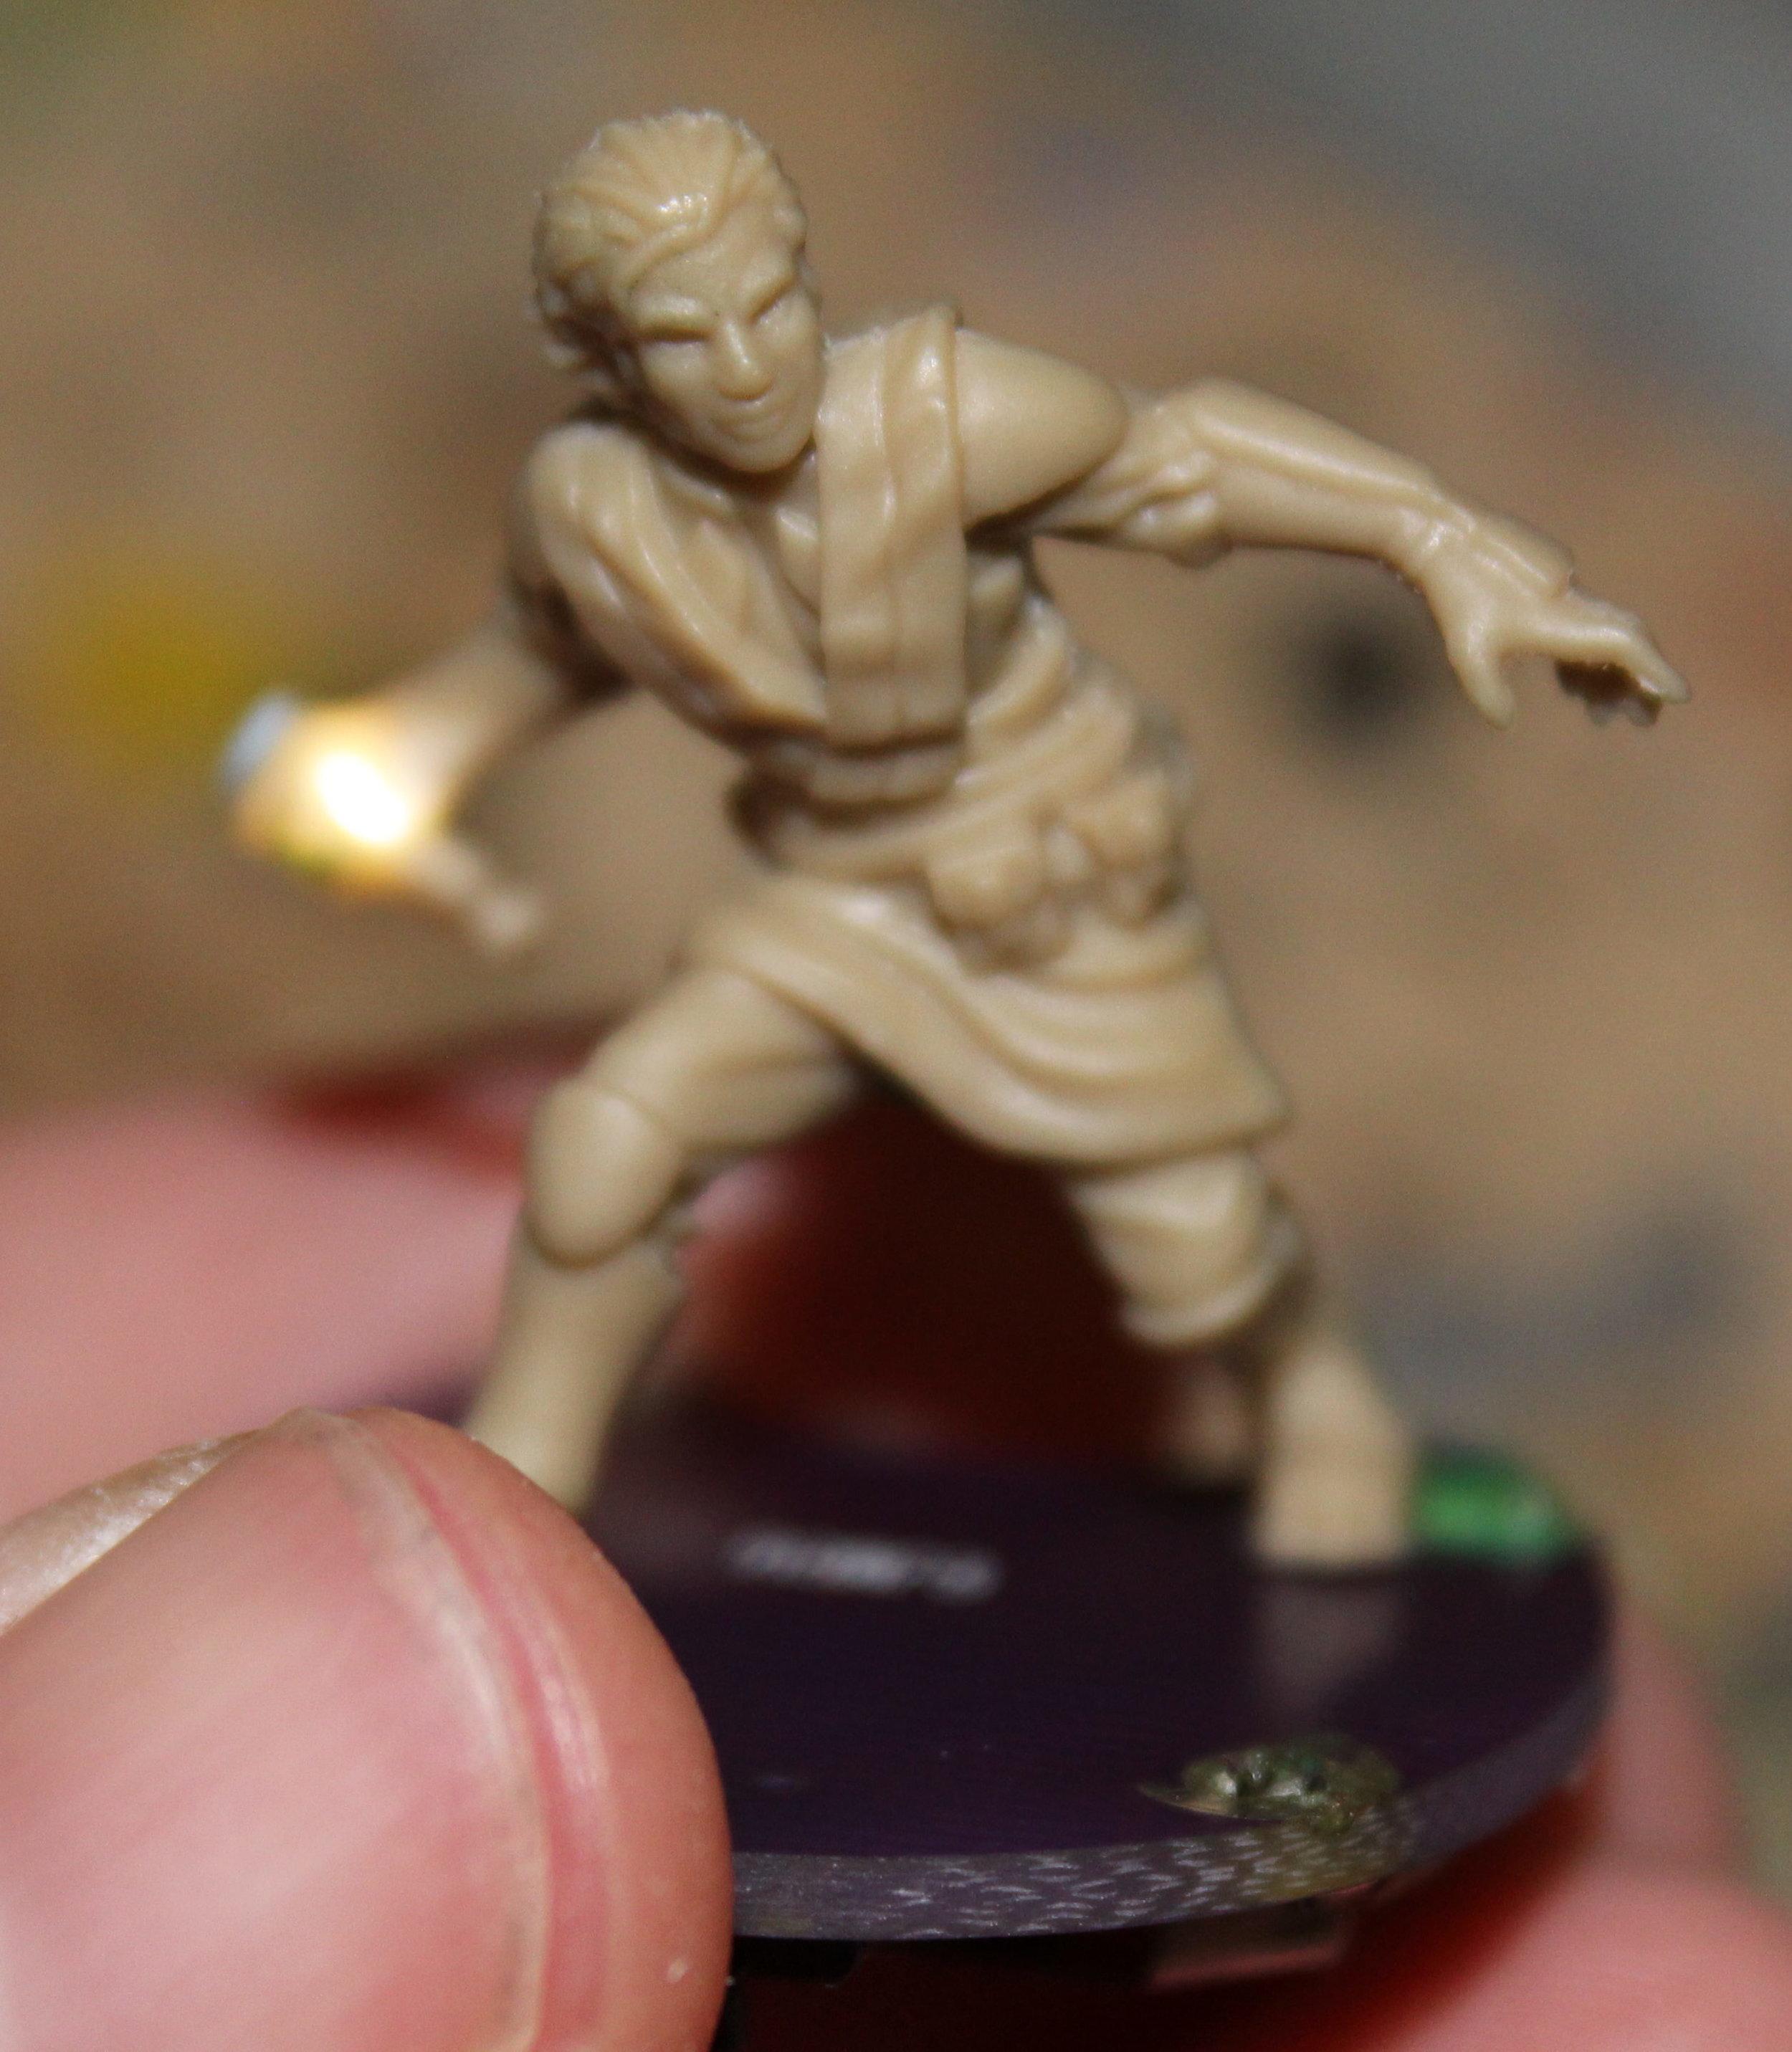 Imperial_Assault_Board_Game_LED_lightsaber_miniature_11.jpg